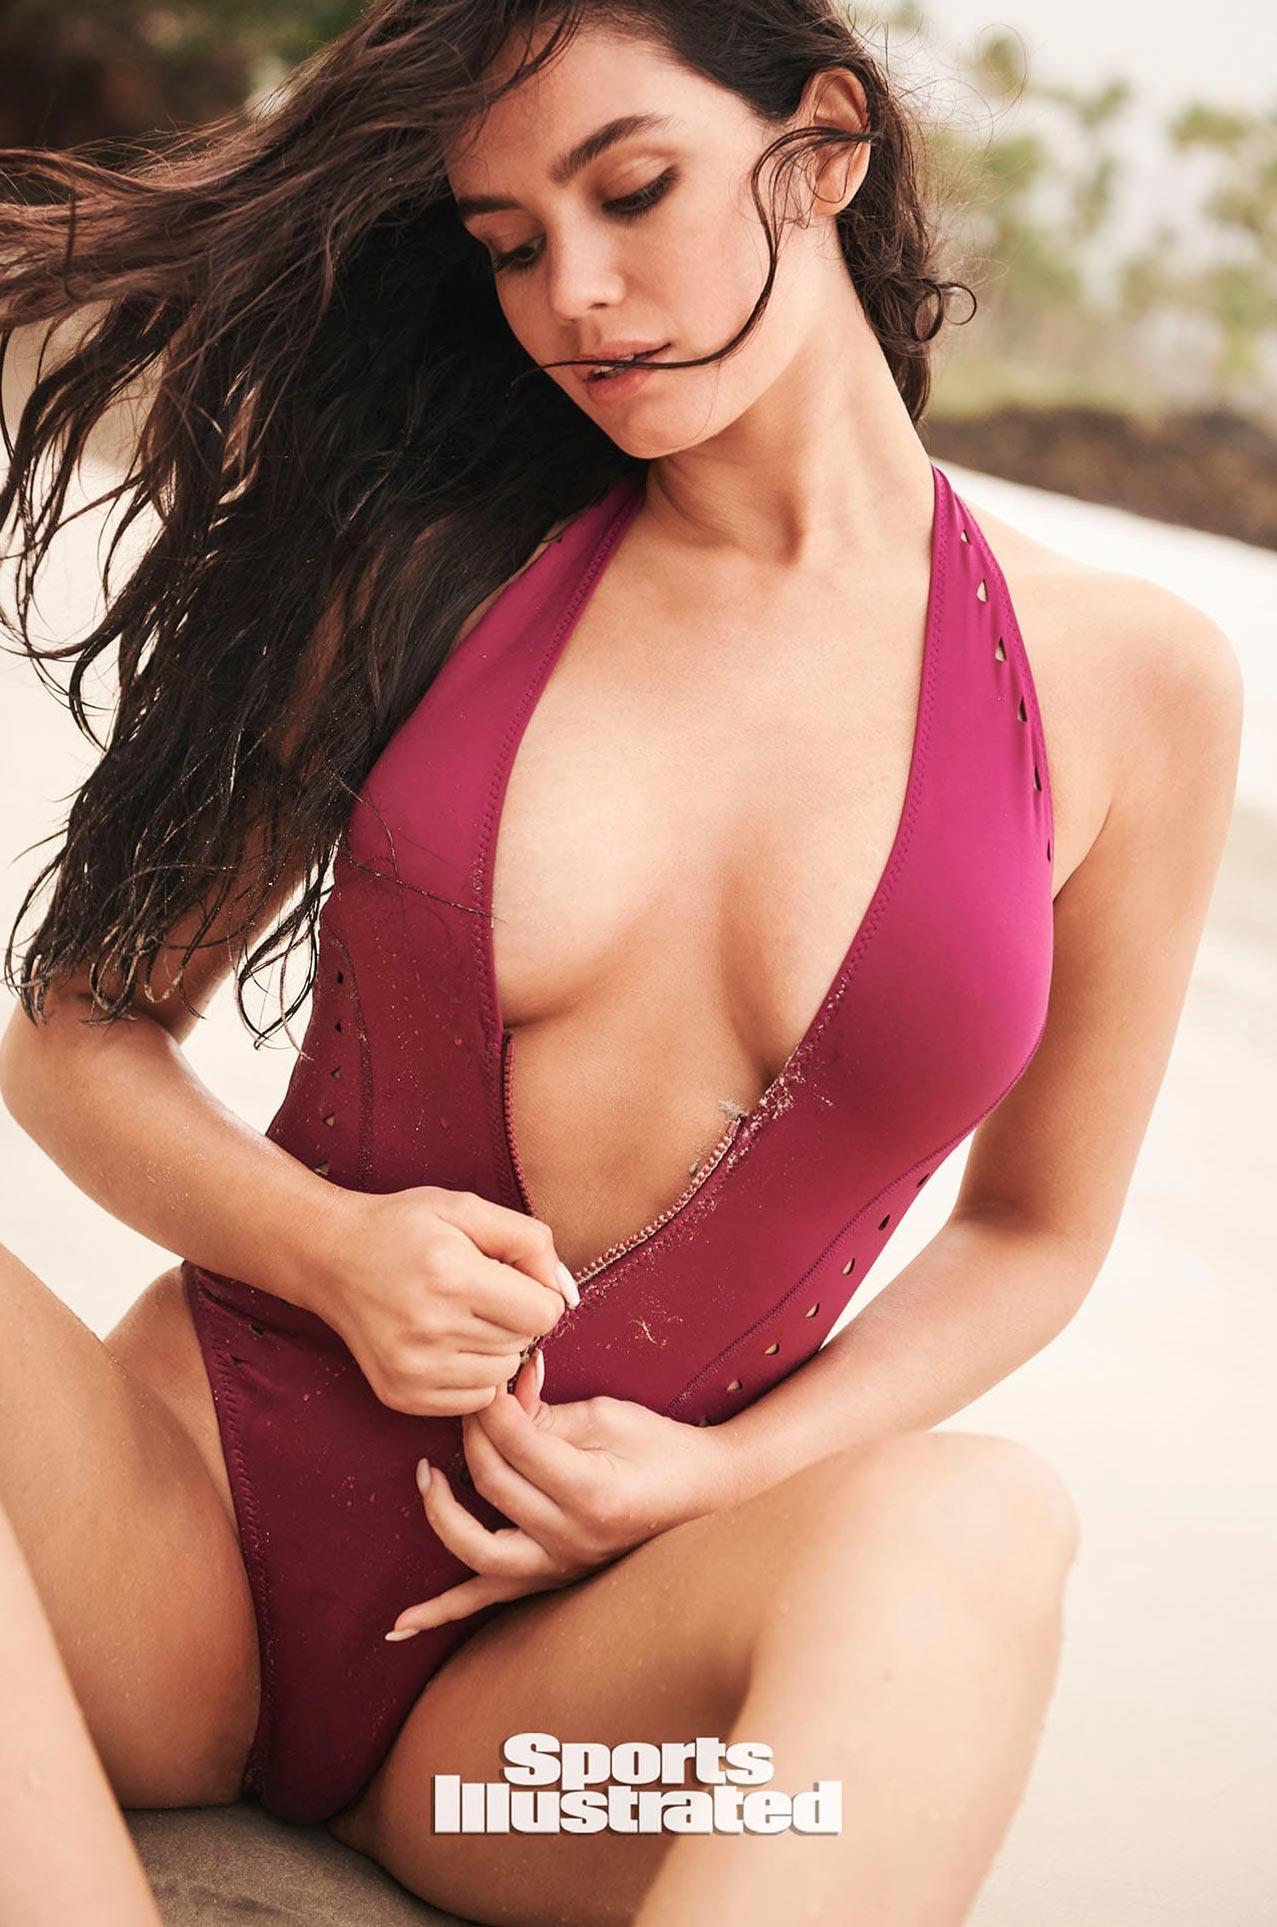 Энн де Паула в каталоге купальников Sports Illustrated Swimsuit 2020 / фото 17